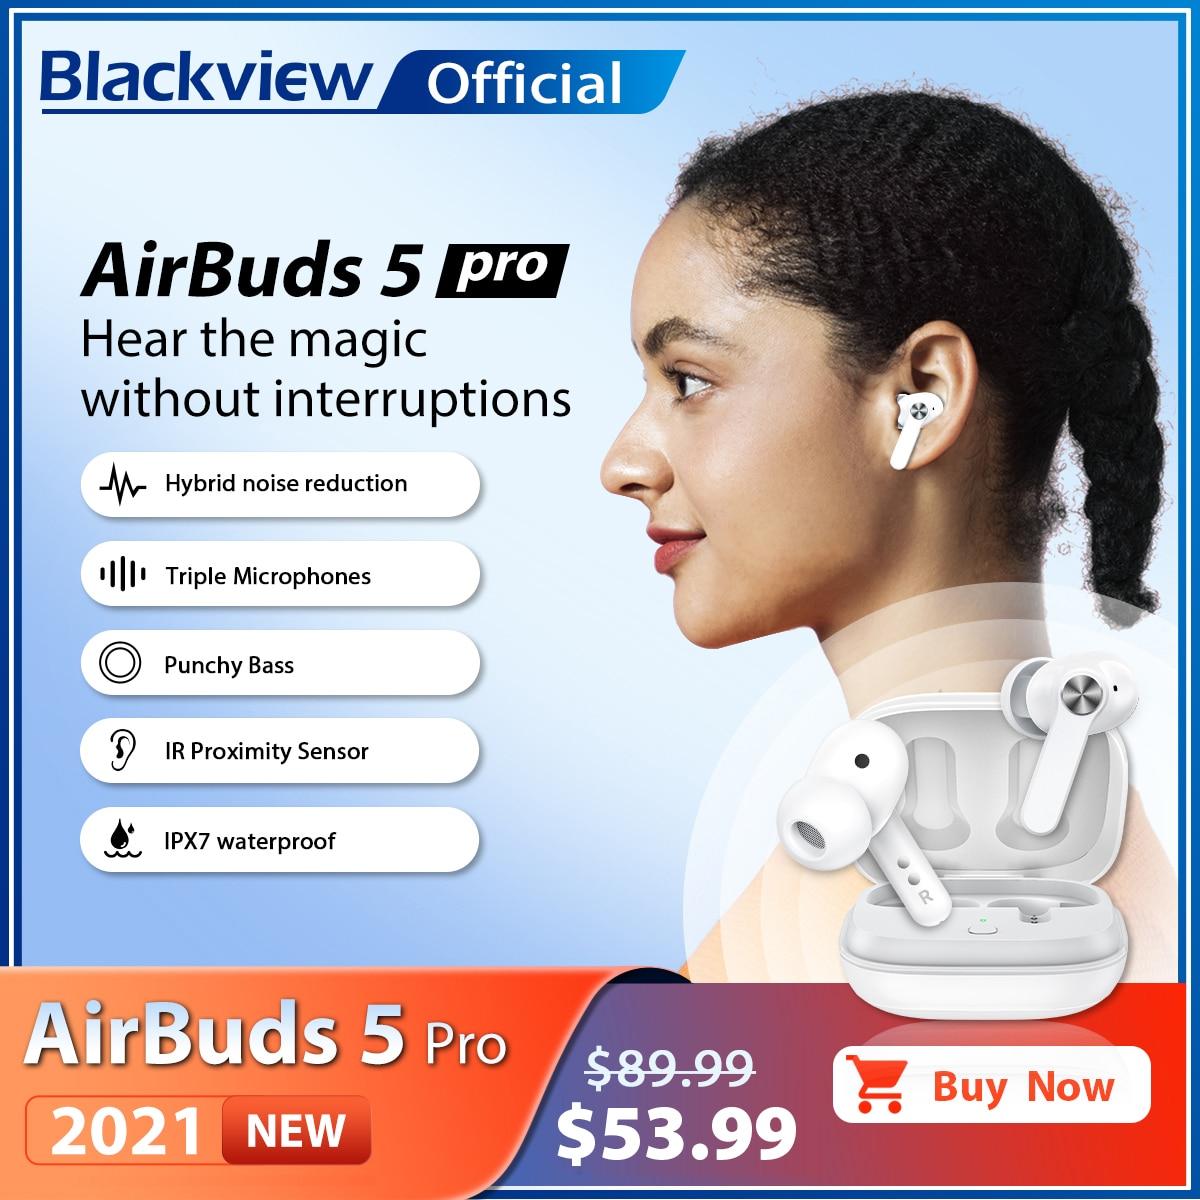 TWS-наушники Blackview AirBuds 5 Pro с поддержкой Bluetooth и защитой класса IPX7